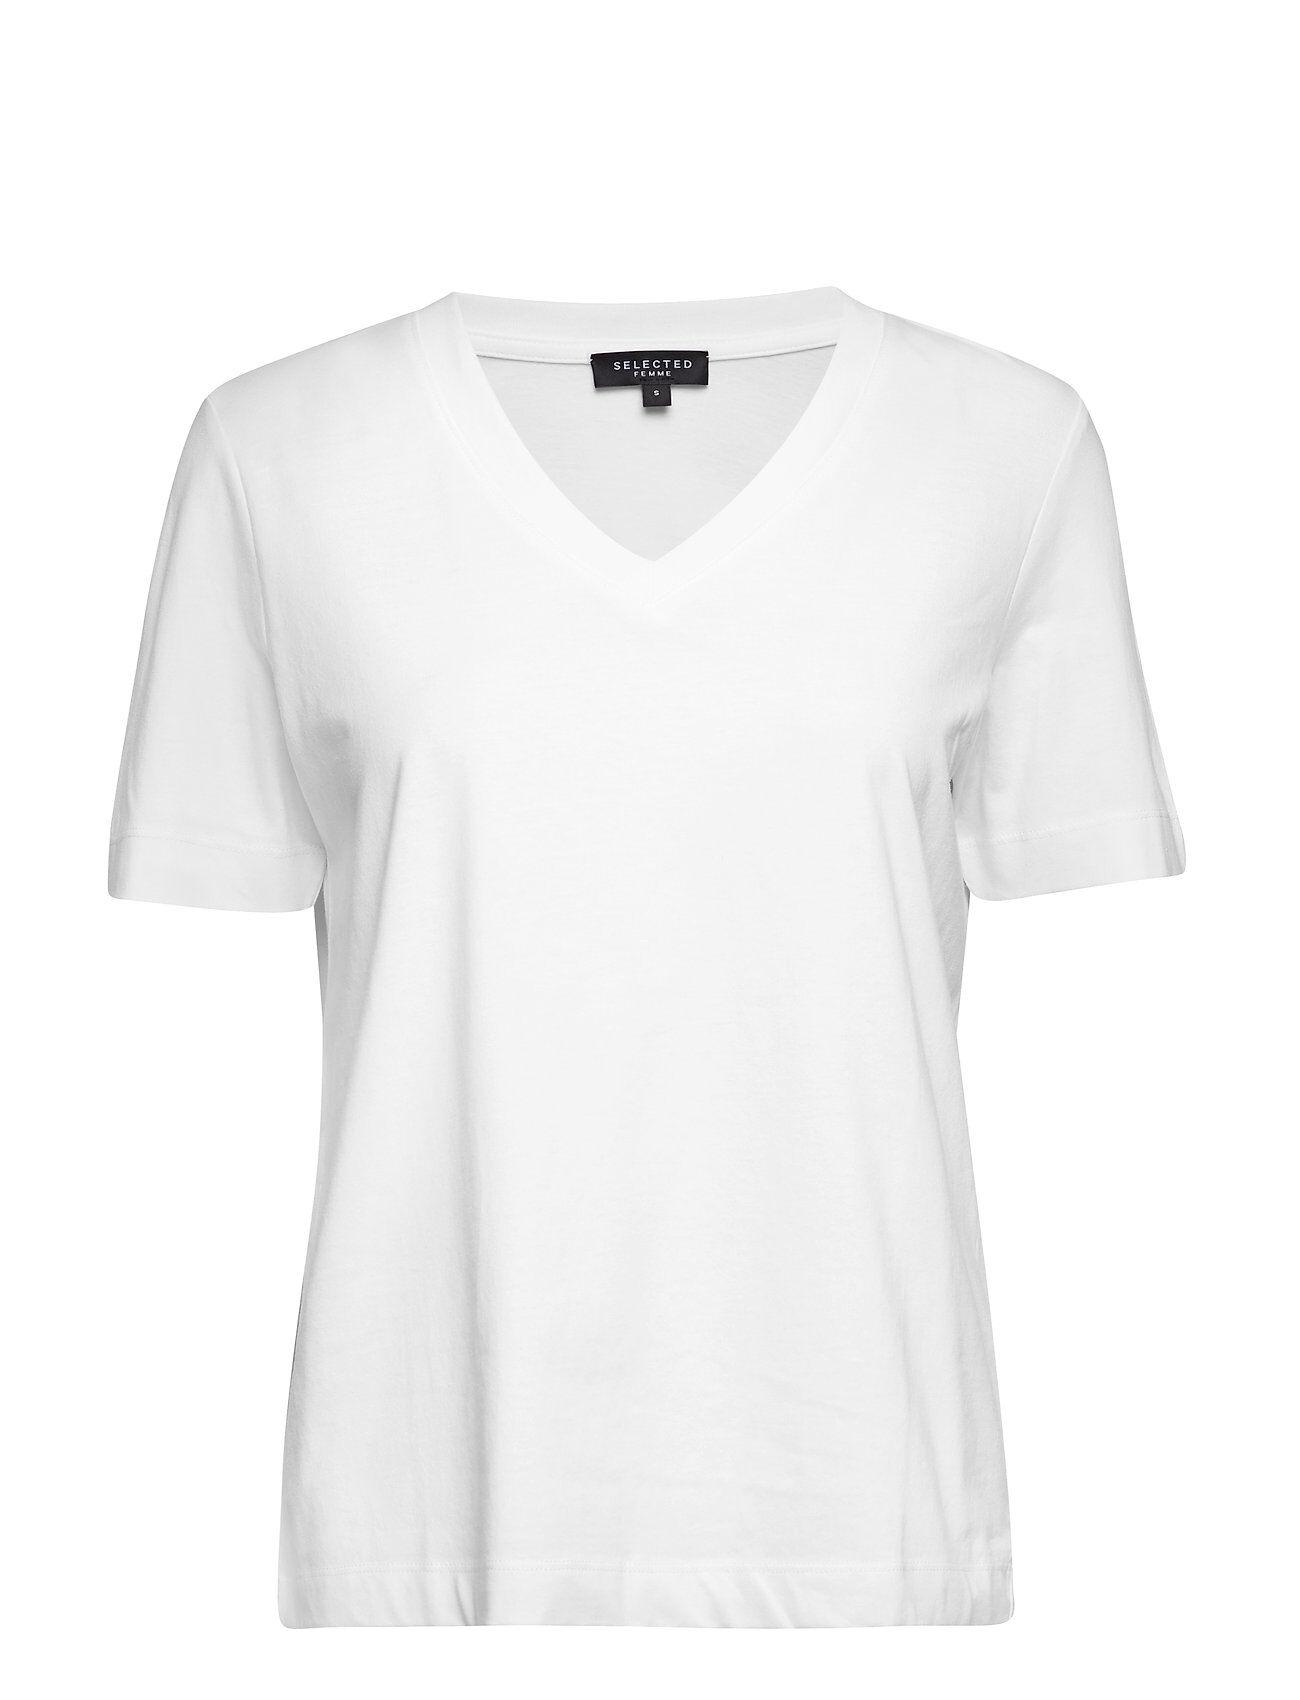 Selected Femme Slfstandard Ss V-Neck Tee Noos T-shirts & Tops Short-sleeved Valkoinen Selected Femme